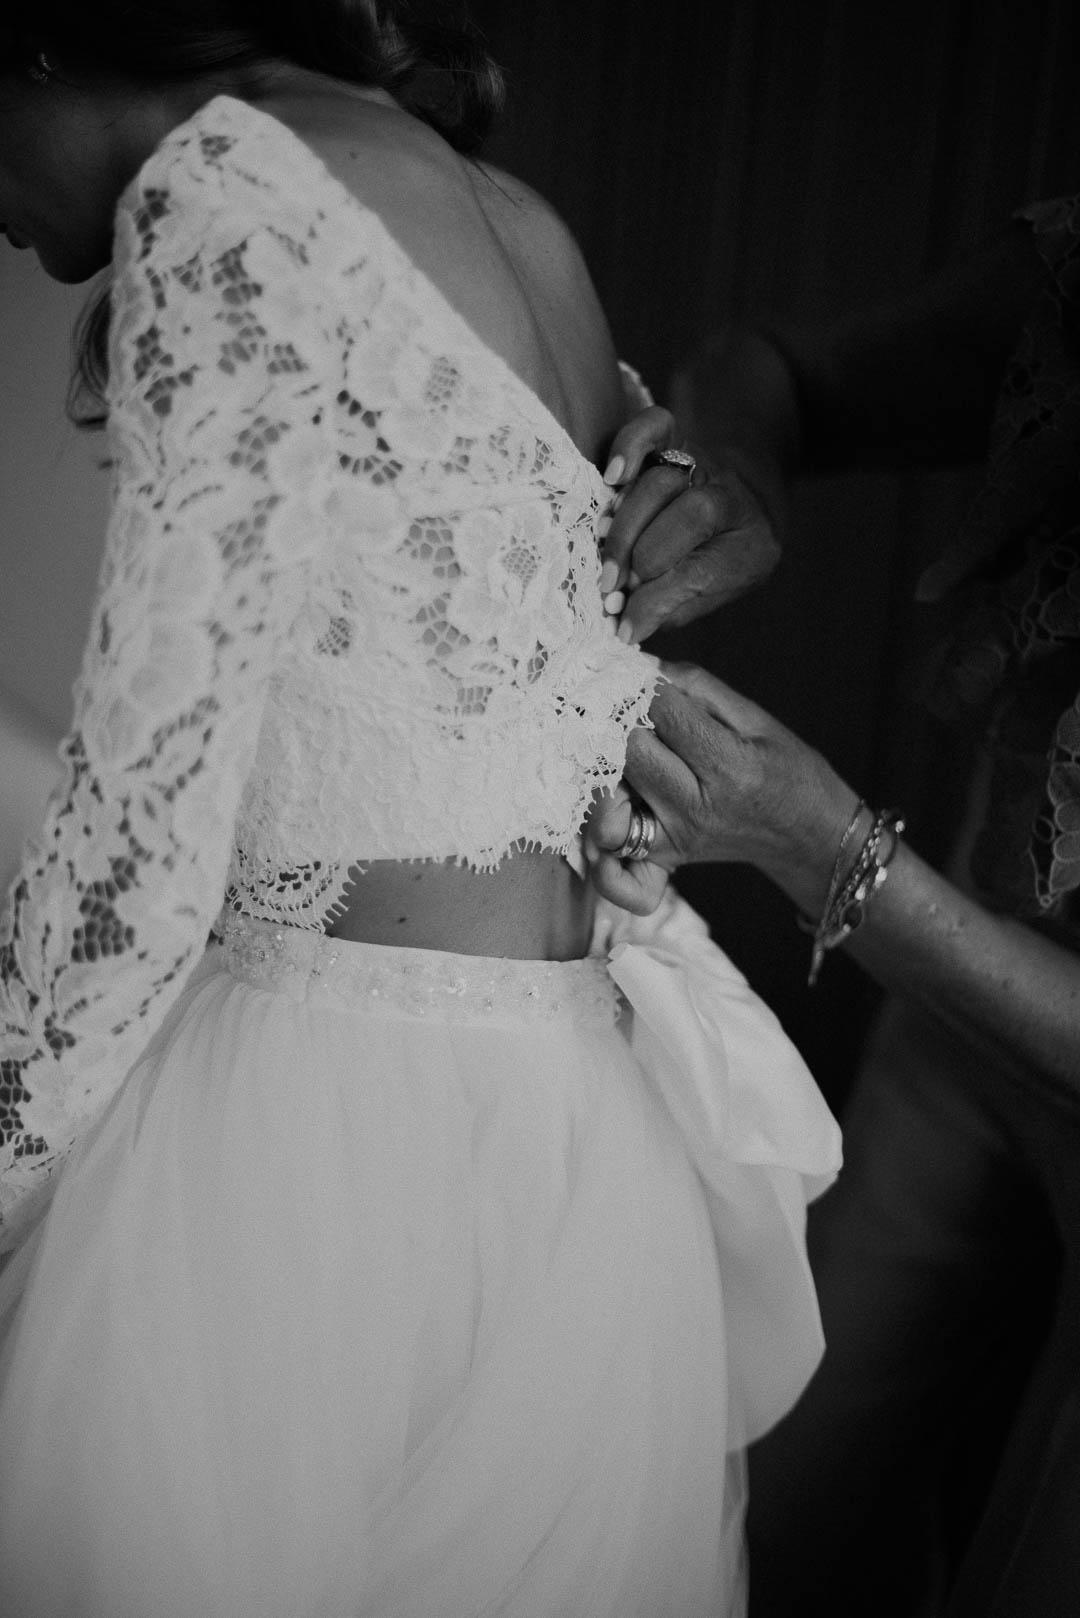 wedding-photographer-destination-fineart-bespoke-reportage-napoli-nabilah-vivianeizzo-spazio46-41